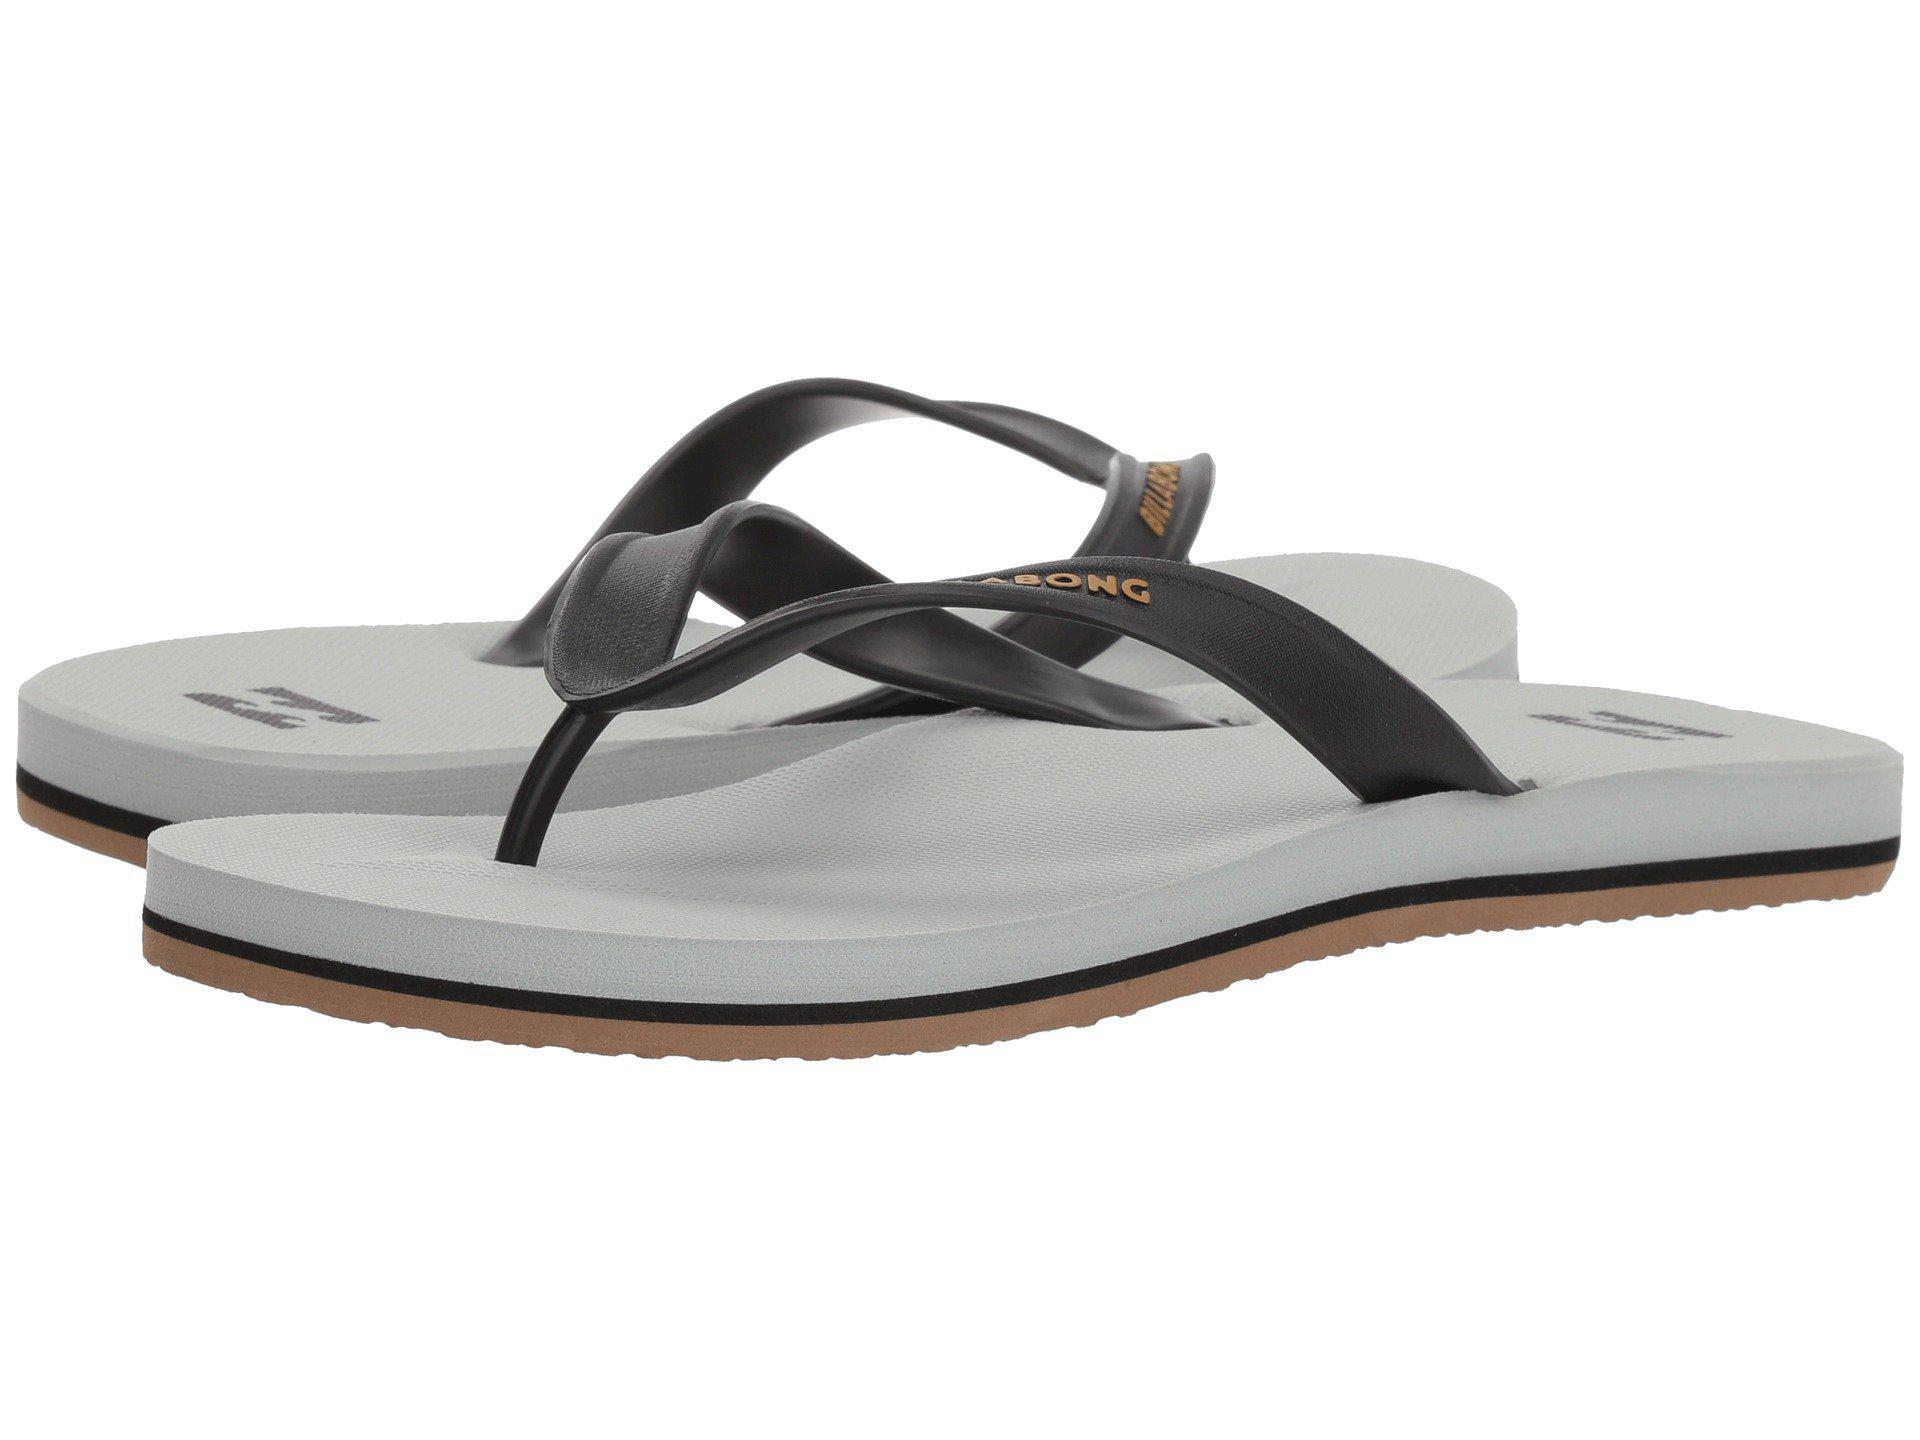 c14815e1a4de Lyst - Billabong All Day Solid Sandal (black 1) Men s Sandals in Gray